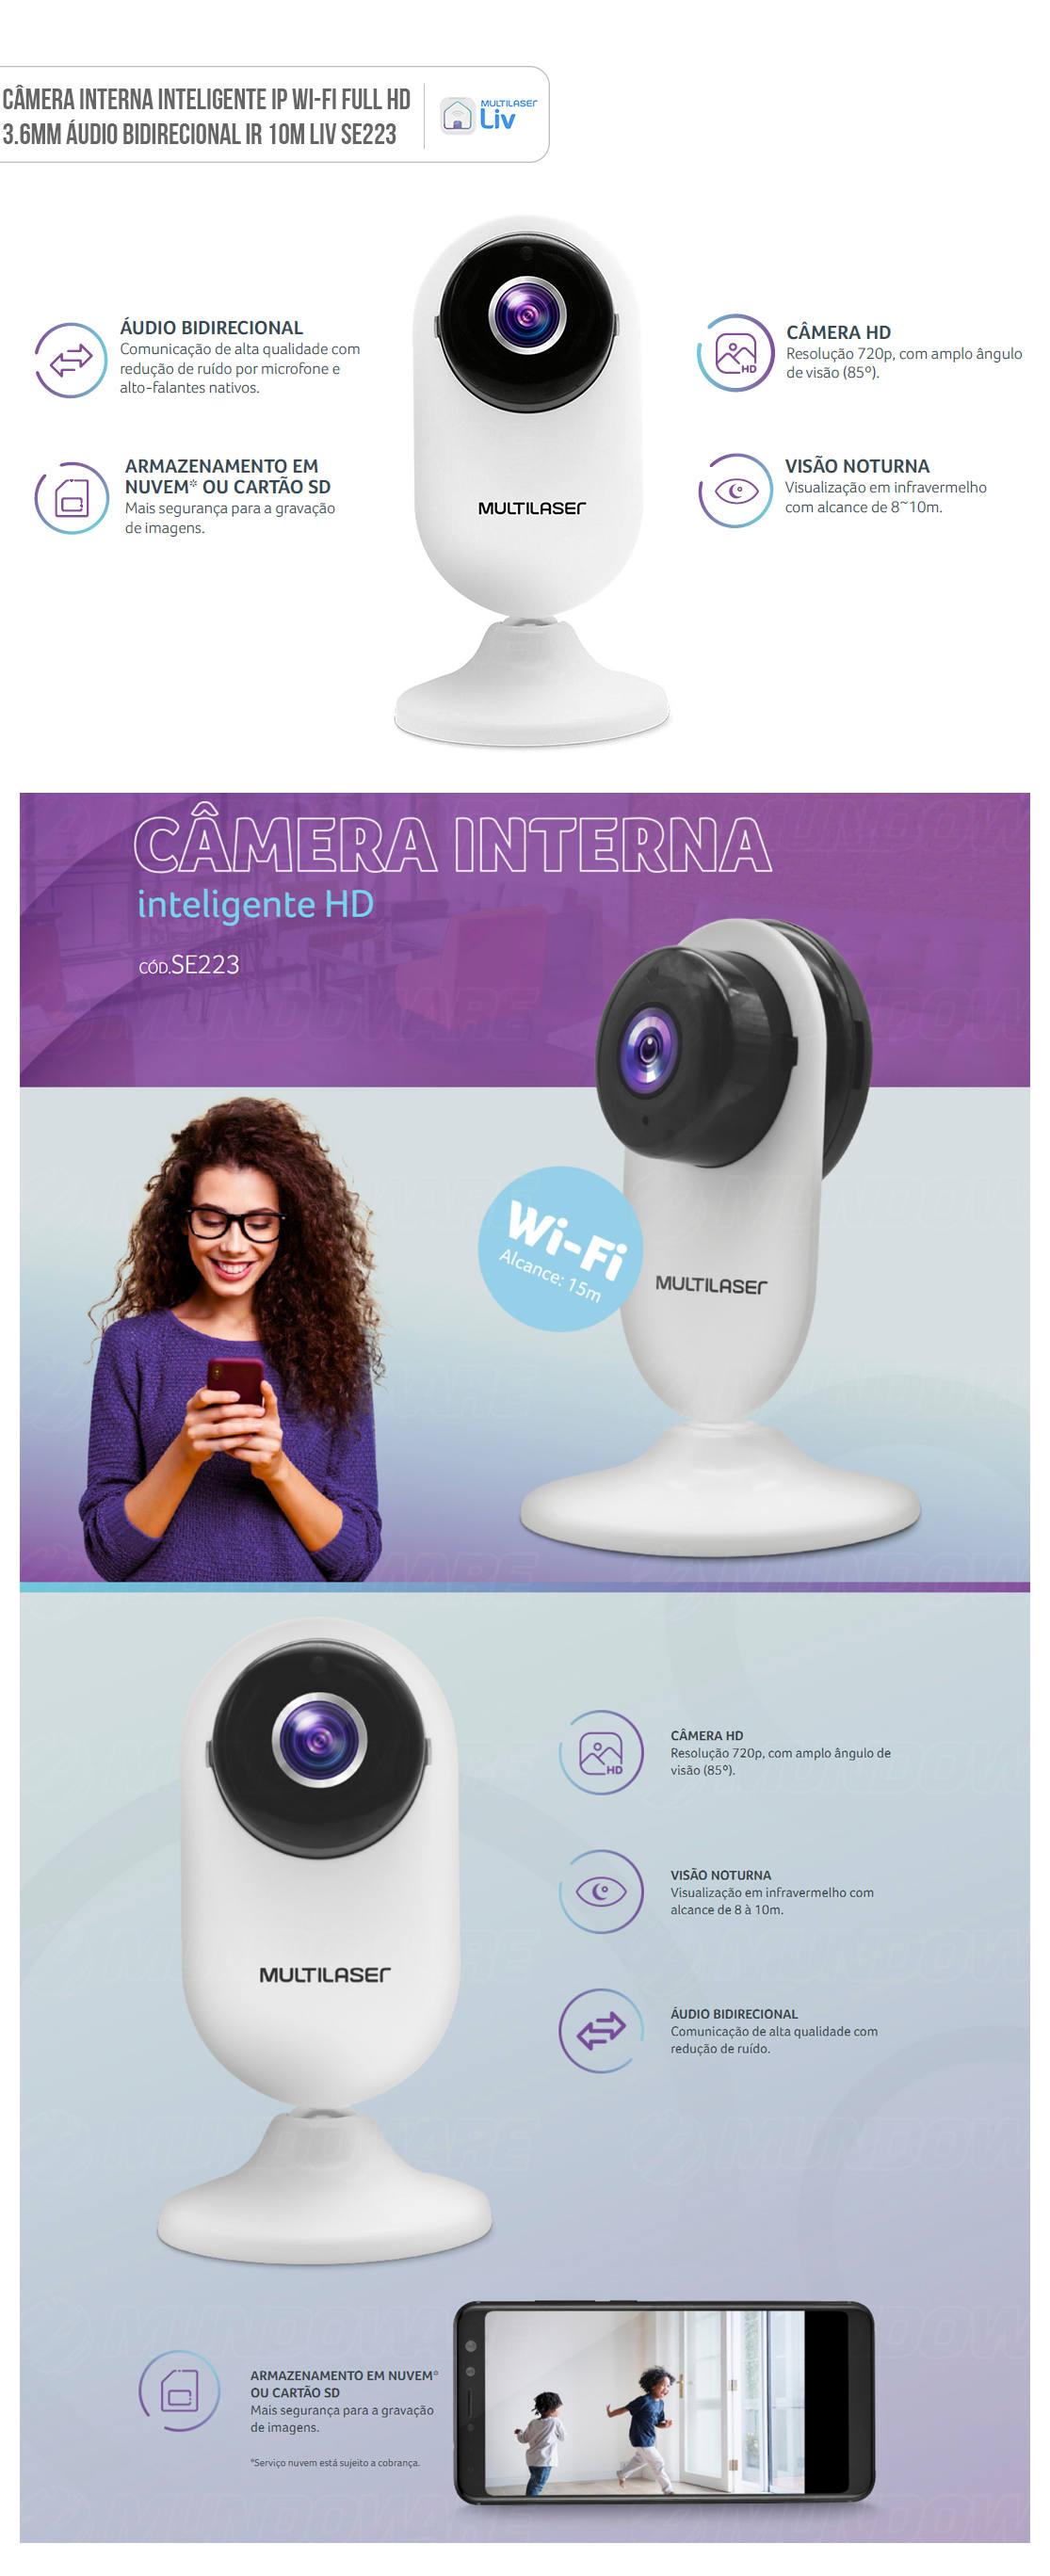 Câmera IP Interna Inteligente Wi-Fi Full HD 3.6mm Áudio Bidirecional IR 10m Liv SE223